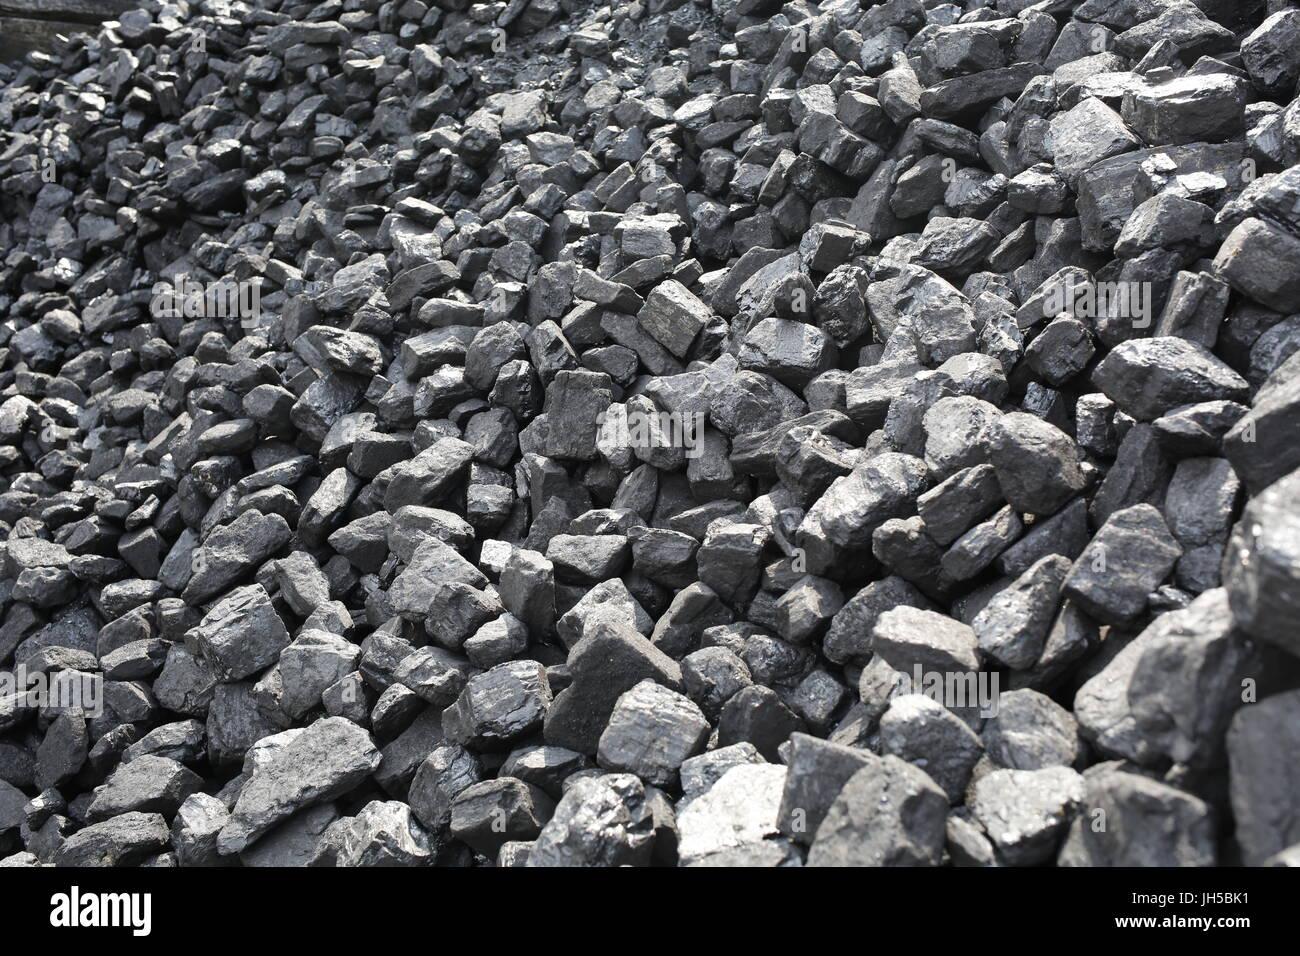 coal pile - Stock Image